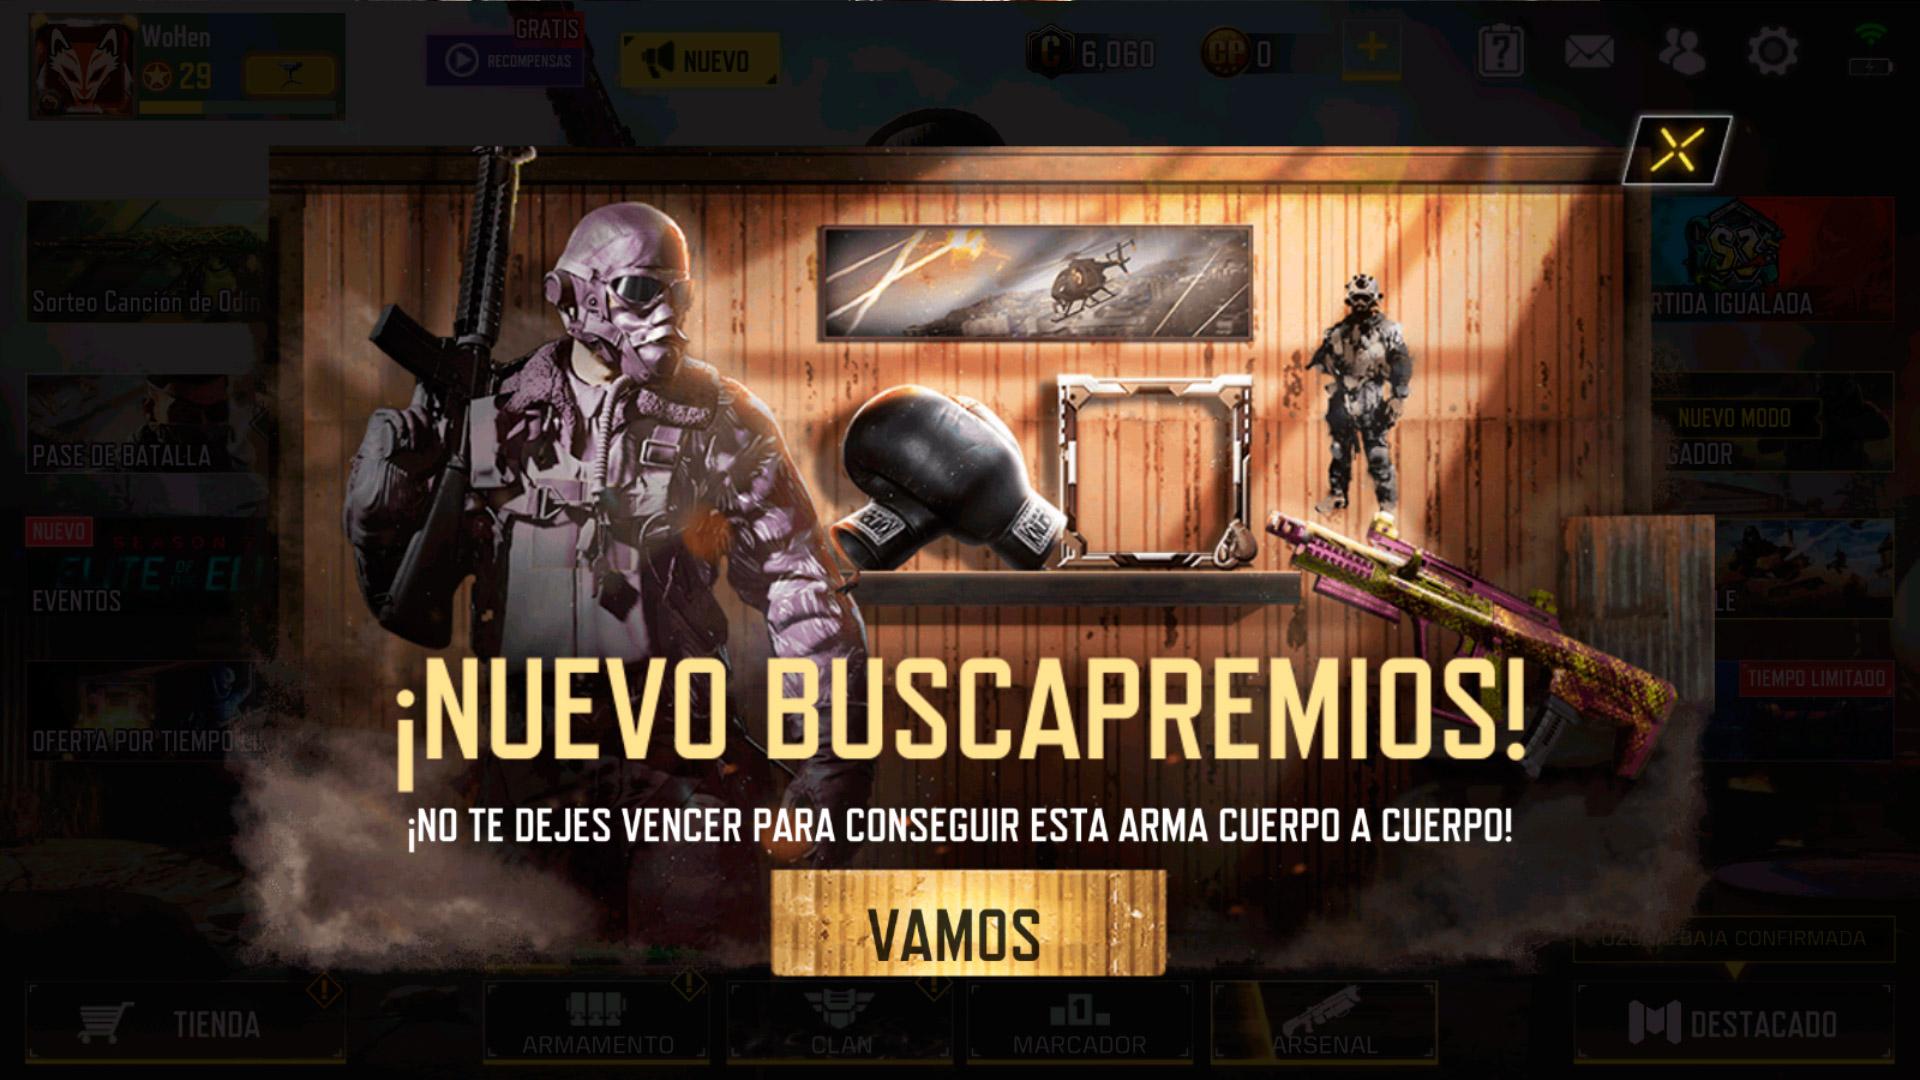 Buscapremios en Call of Duty Mobile